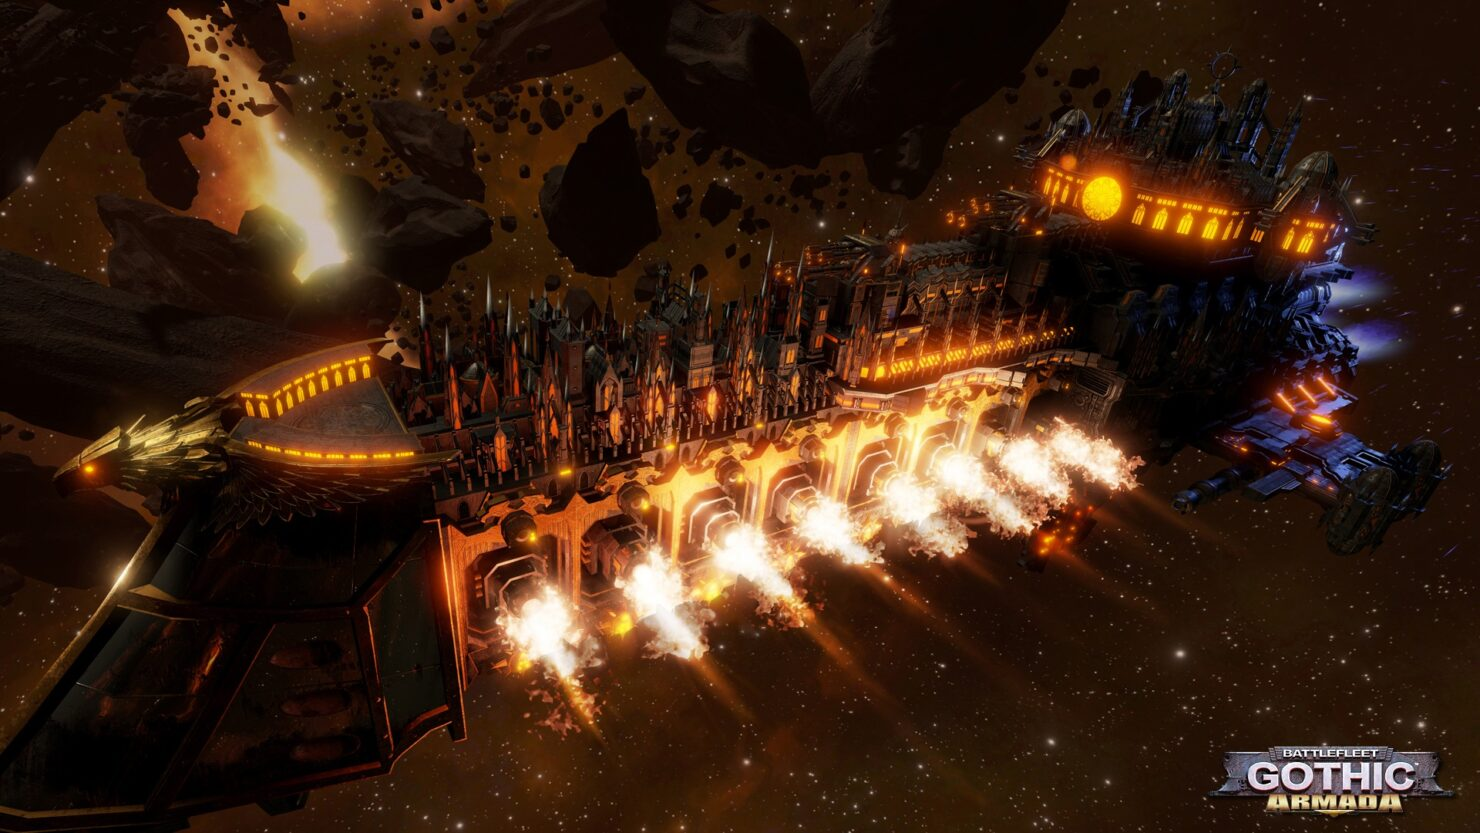 battlefleet-gothic-armada-3